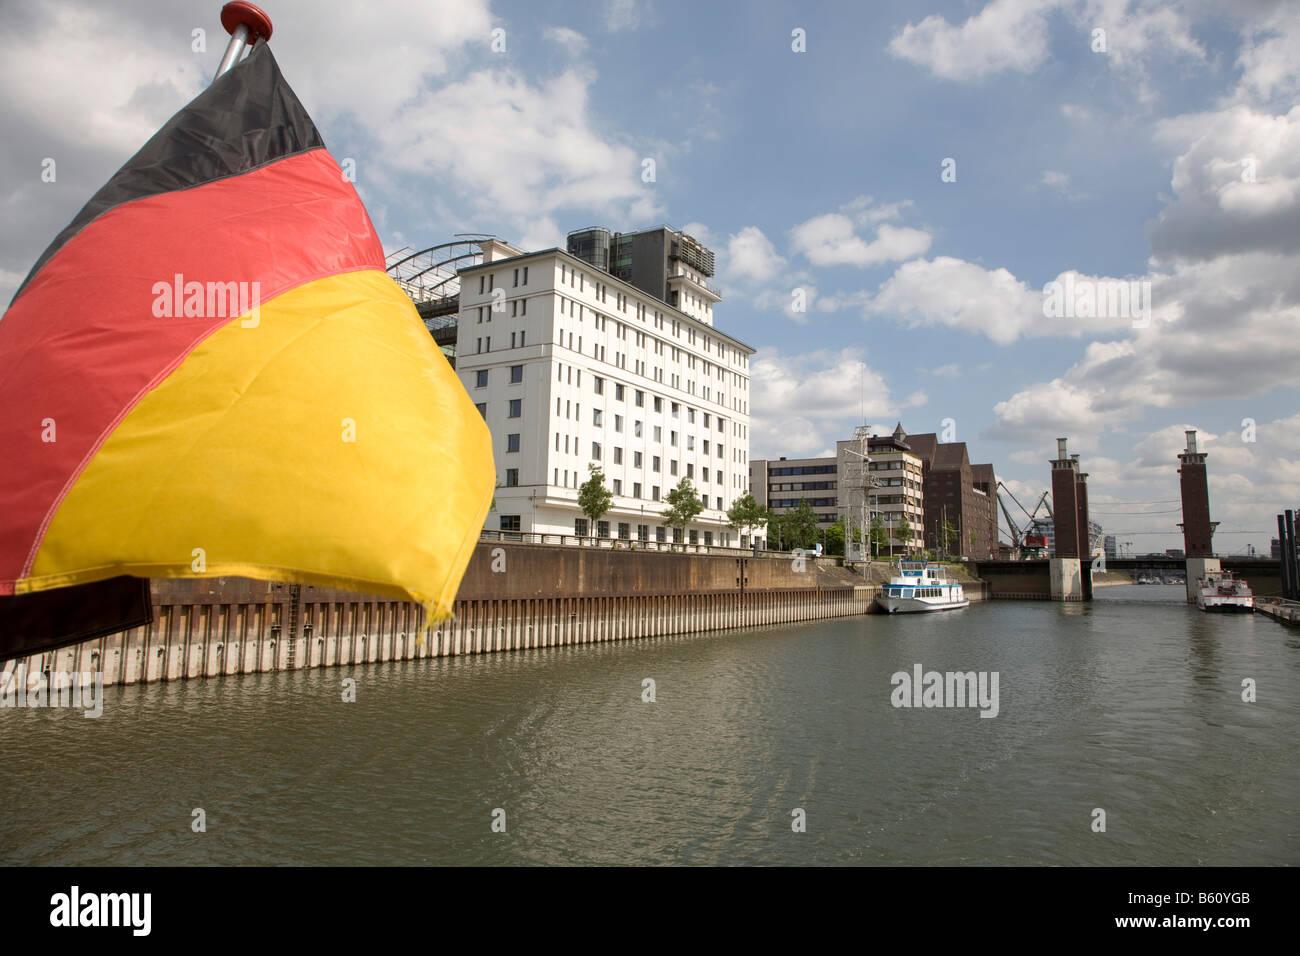 Flag of Germany in front of the Kontorhaus, basin, Duisburg, North Rhine-Westphalia - Stock Image